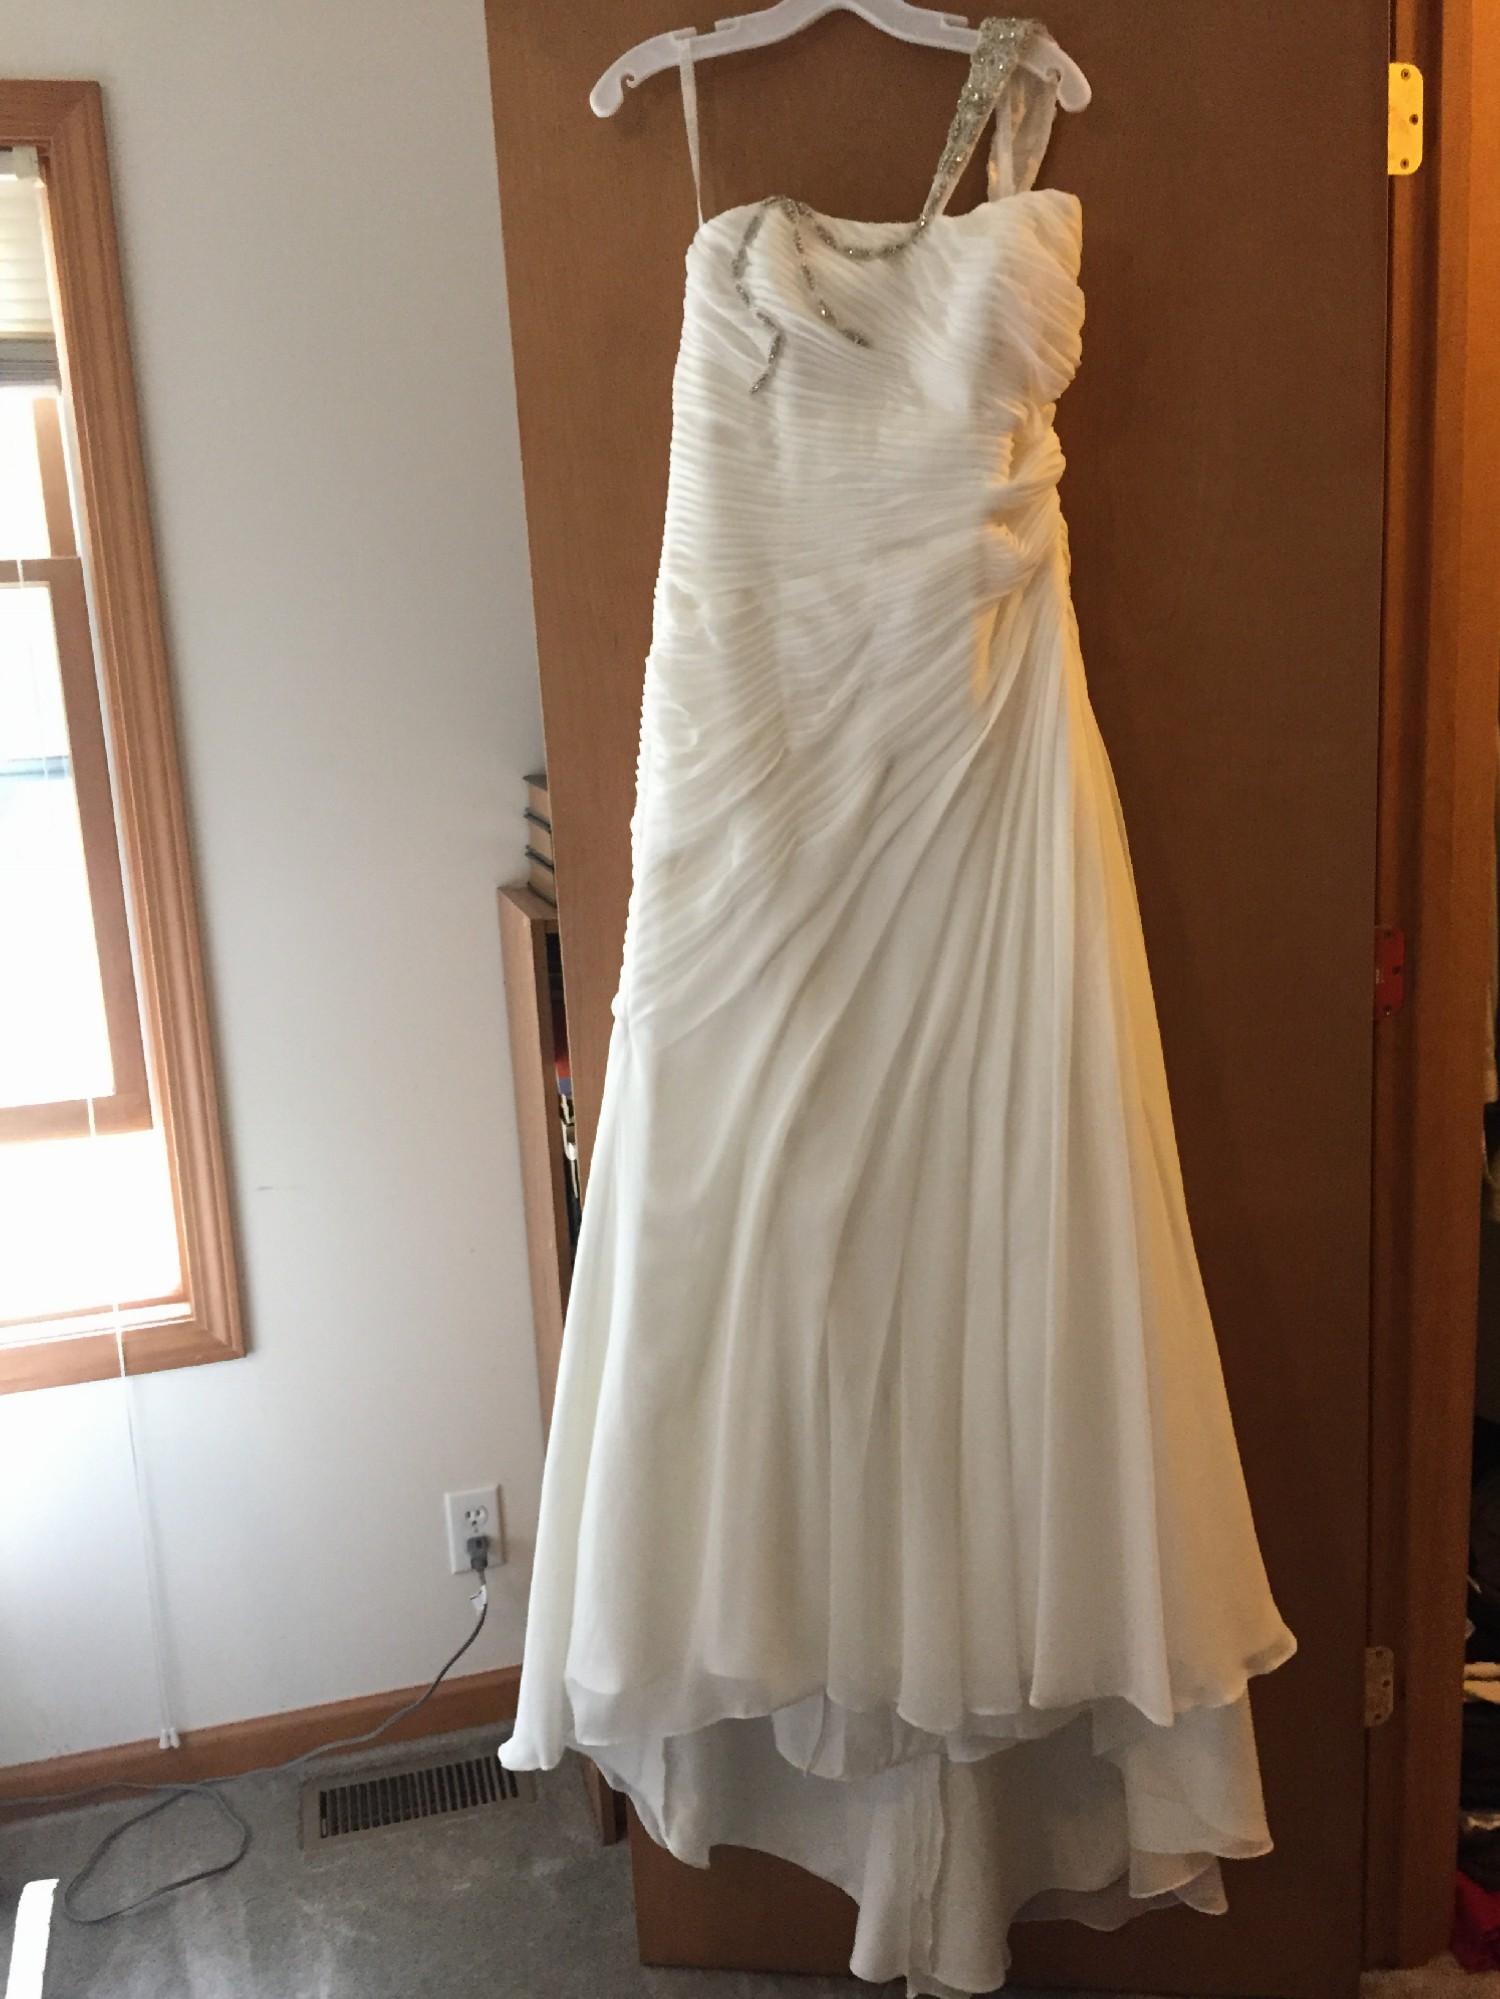 e8348a0a2b68 David's Bridal V3540 New Wedding Dress on Sale - Stillwhite